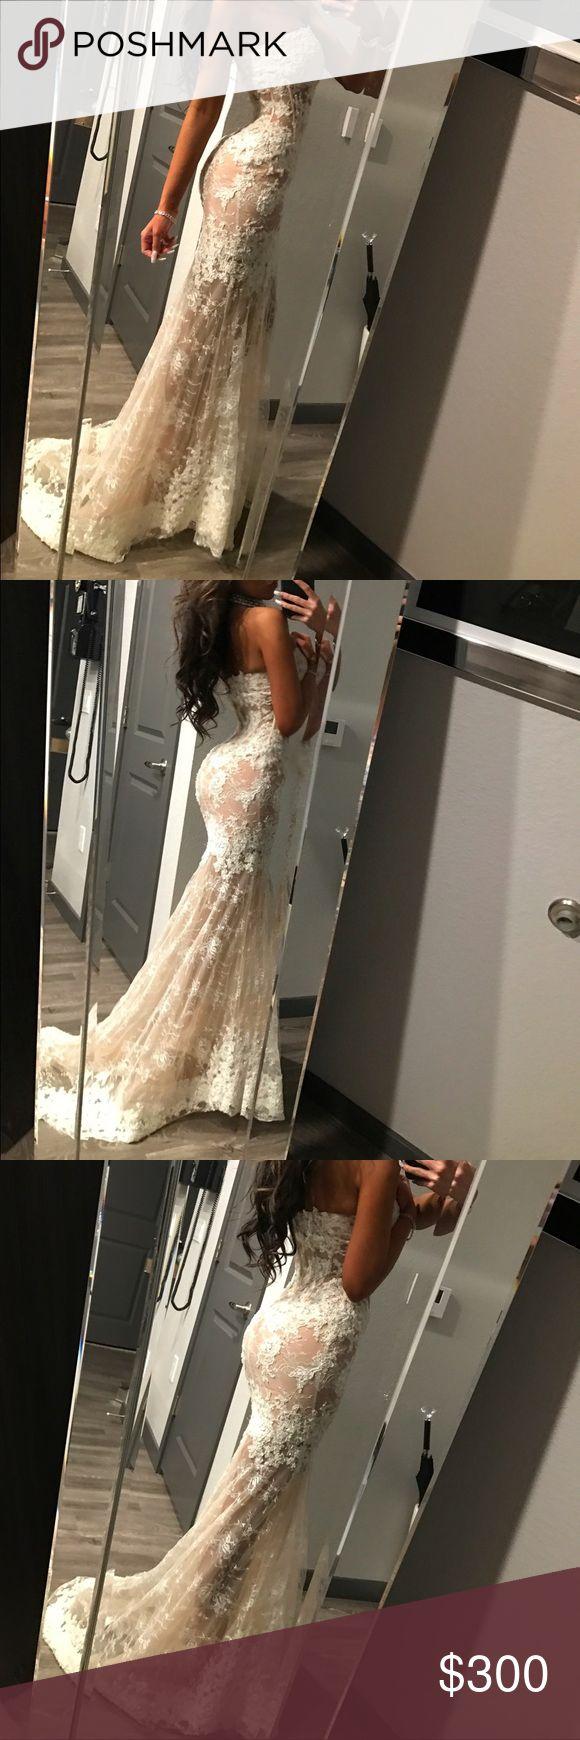 sherri hill white and nude lace sherri hill white lace and nude worn once could be worn as a wedding dress or a reception Sherri Hill Dresses